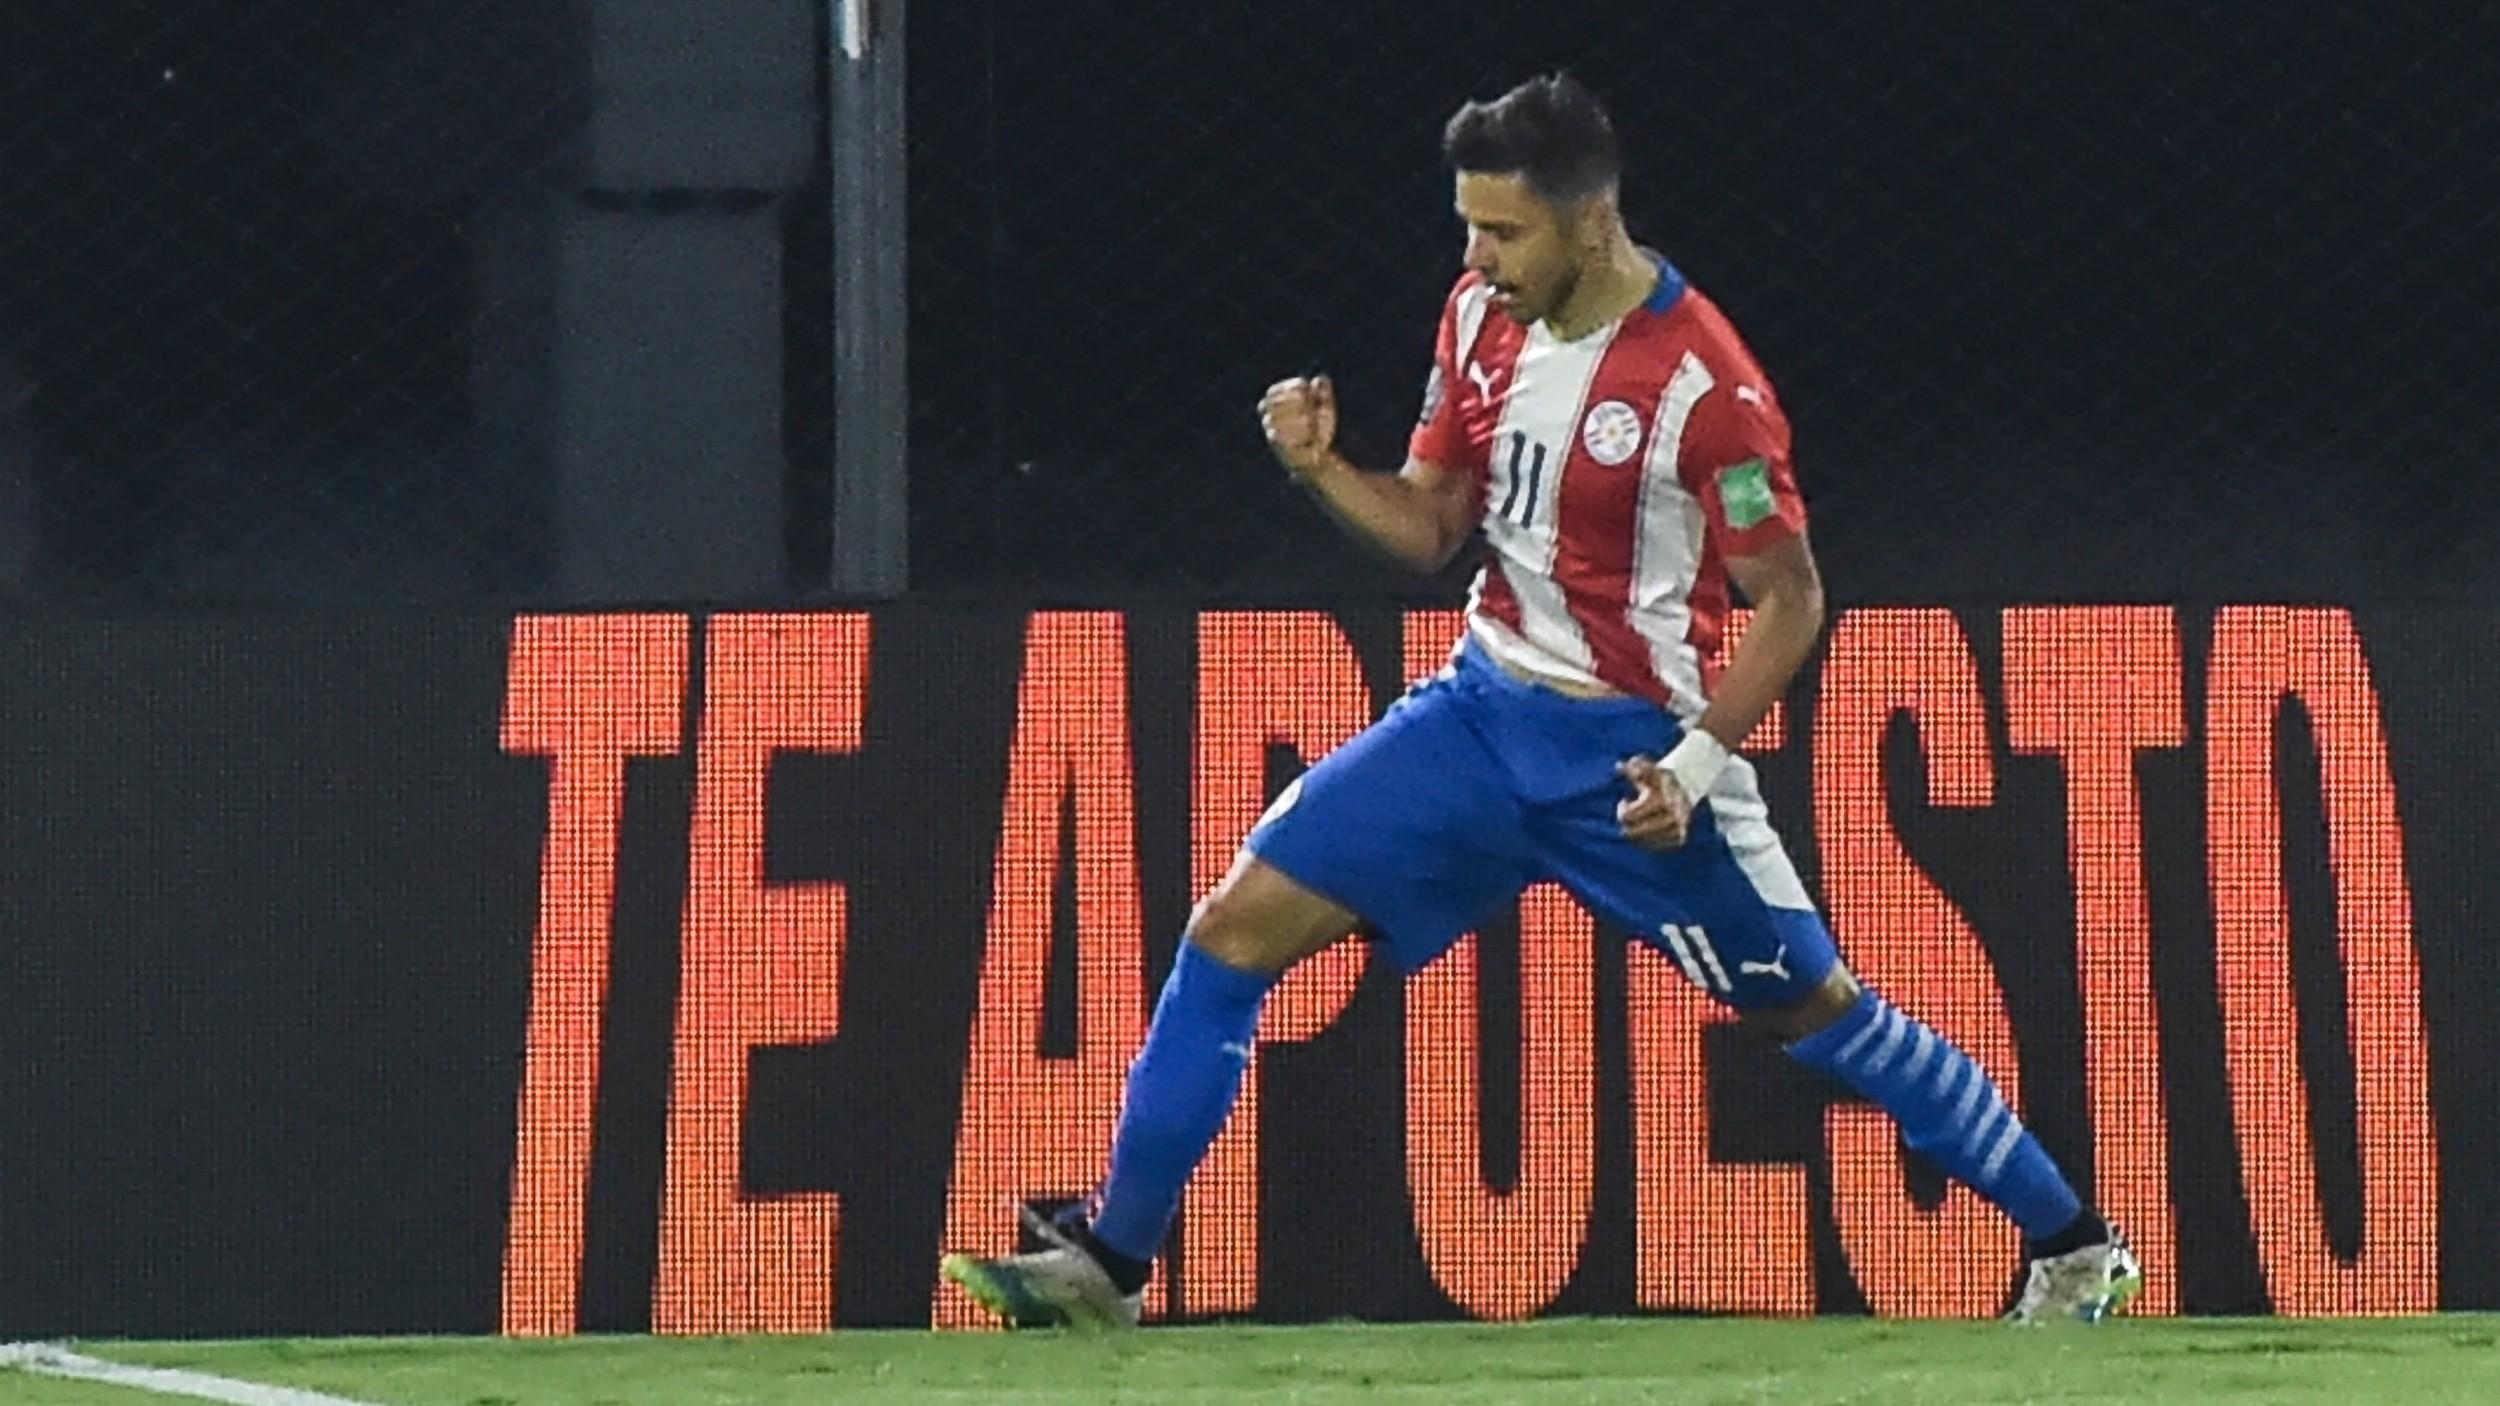 Angel Romero Paraguay Peru Fecha 1 Eliminatorias Sudamericanas Octubre 2020